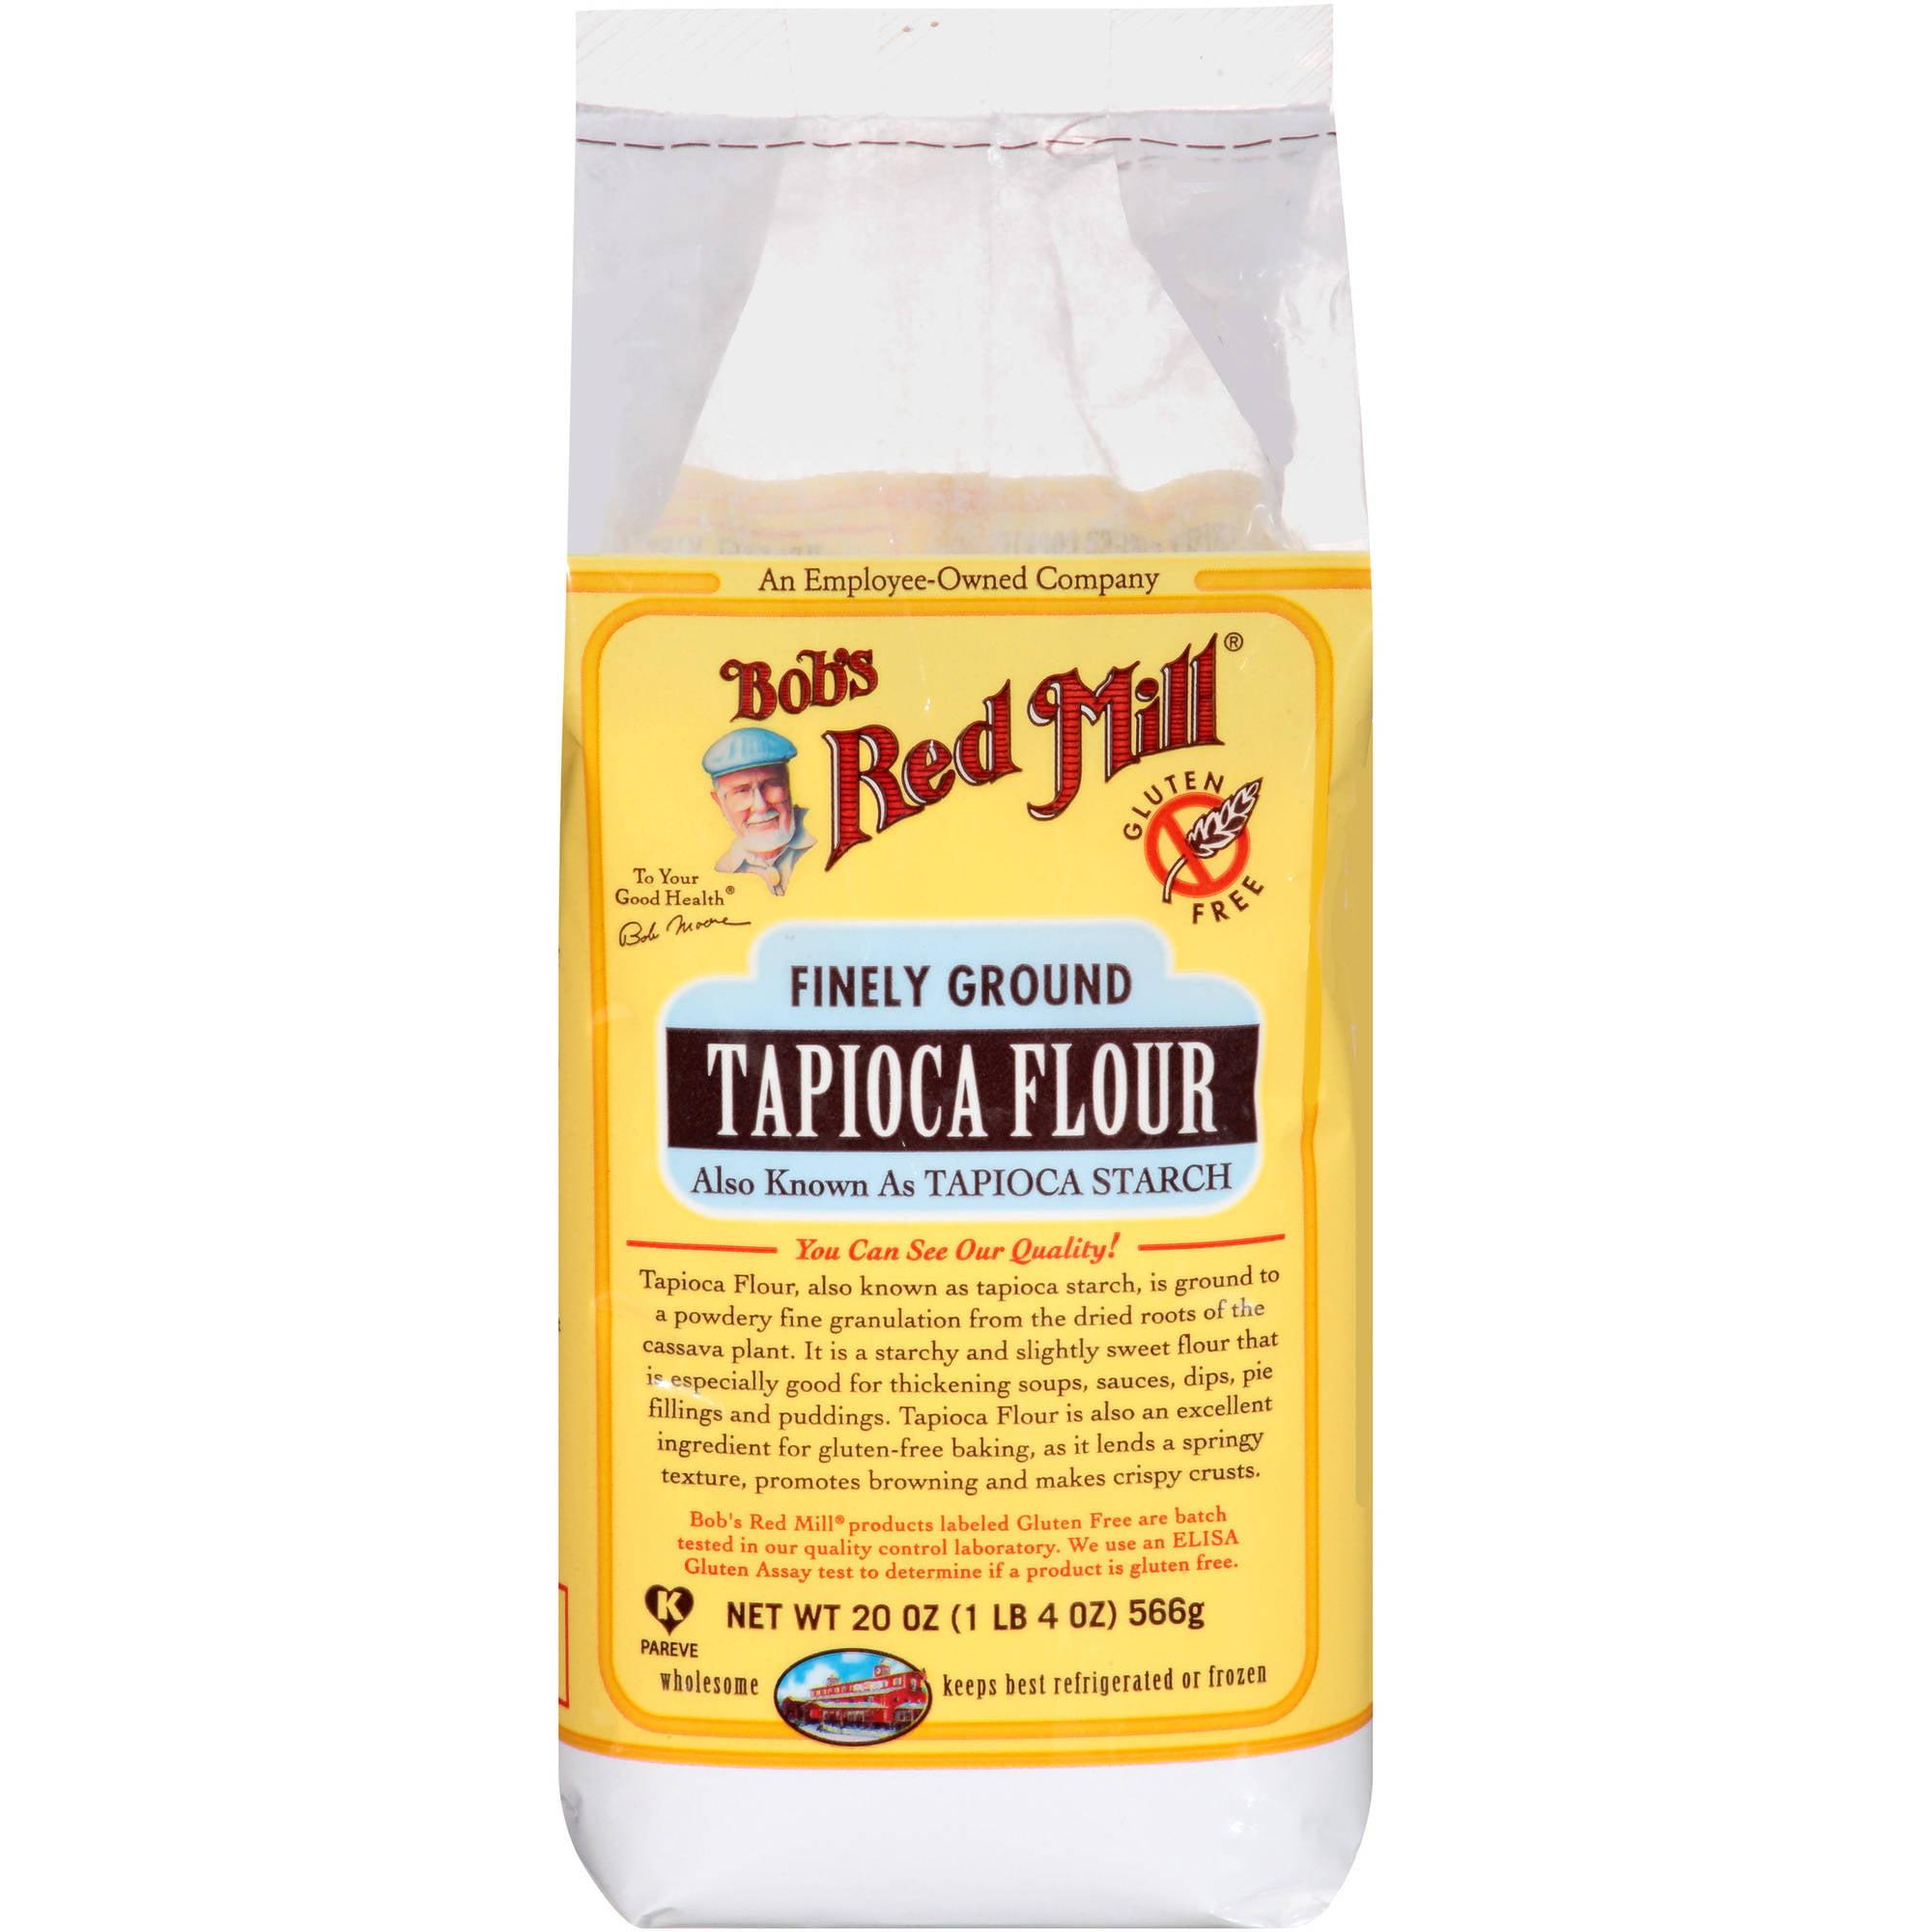 Bobâ€s Red Mill Finely Ground Tapioca Flour, 20 oz by Bob'S Red Mill